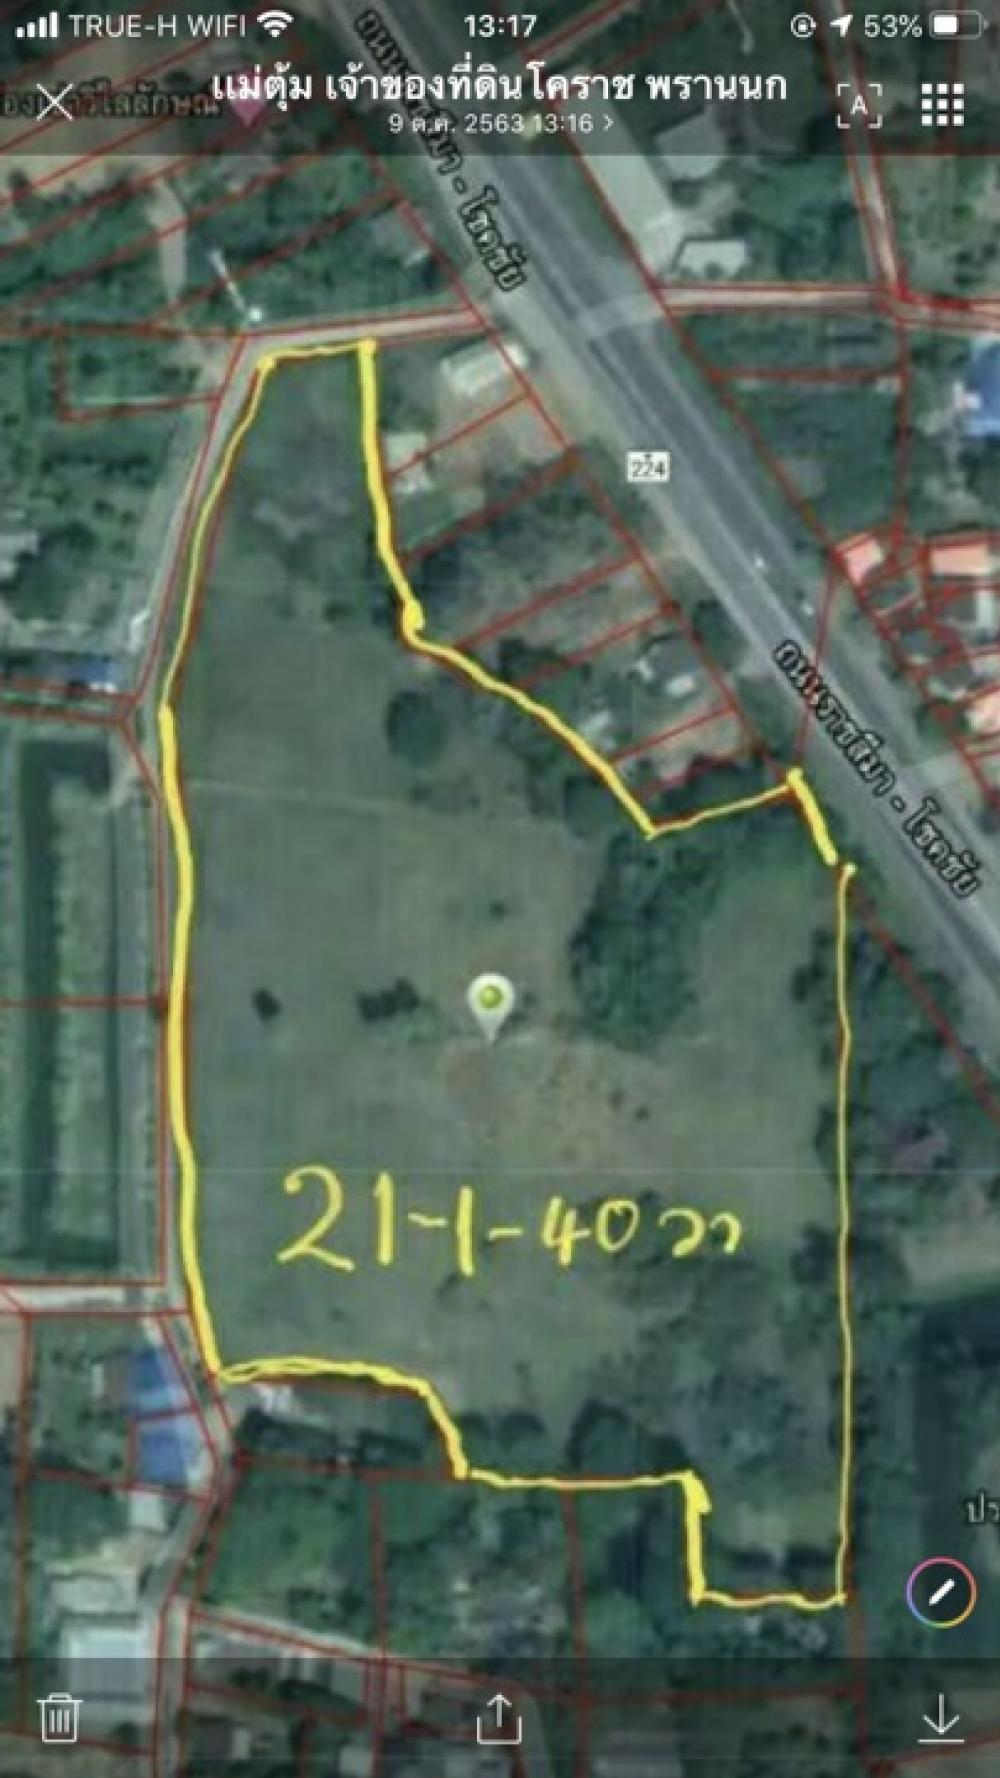 For SaleLandKorat KhaoYai Pak Chong : Land for sale 21 rai on the main road (5 rai of land for sale) near the Korat motorway (No. 6), Bang Pra-in, Saraburi, Nakhon Ratchasima, the whole price is 20 million 21-1-40 rai. All transfer fees and expenses The buyer himself Motorway near completion